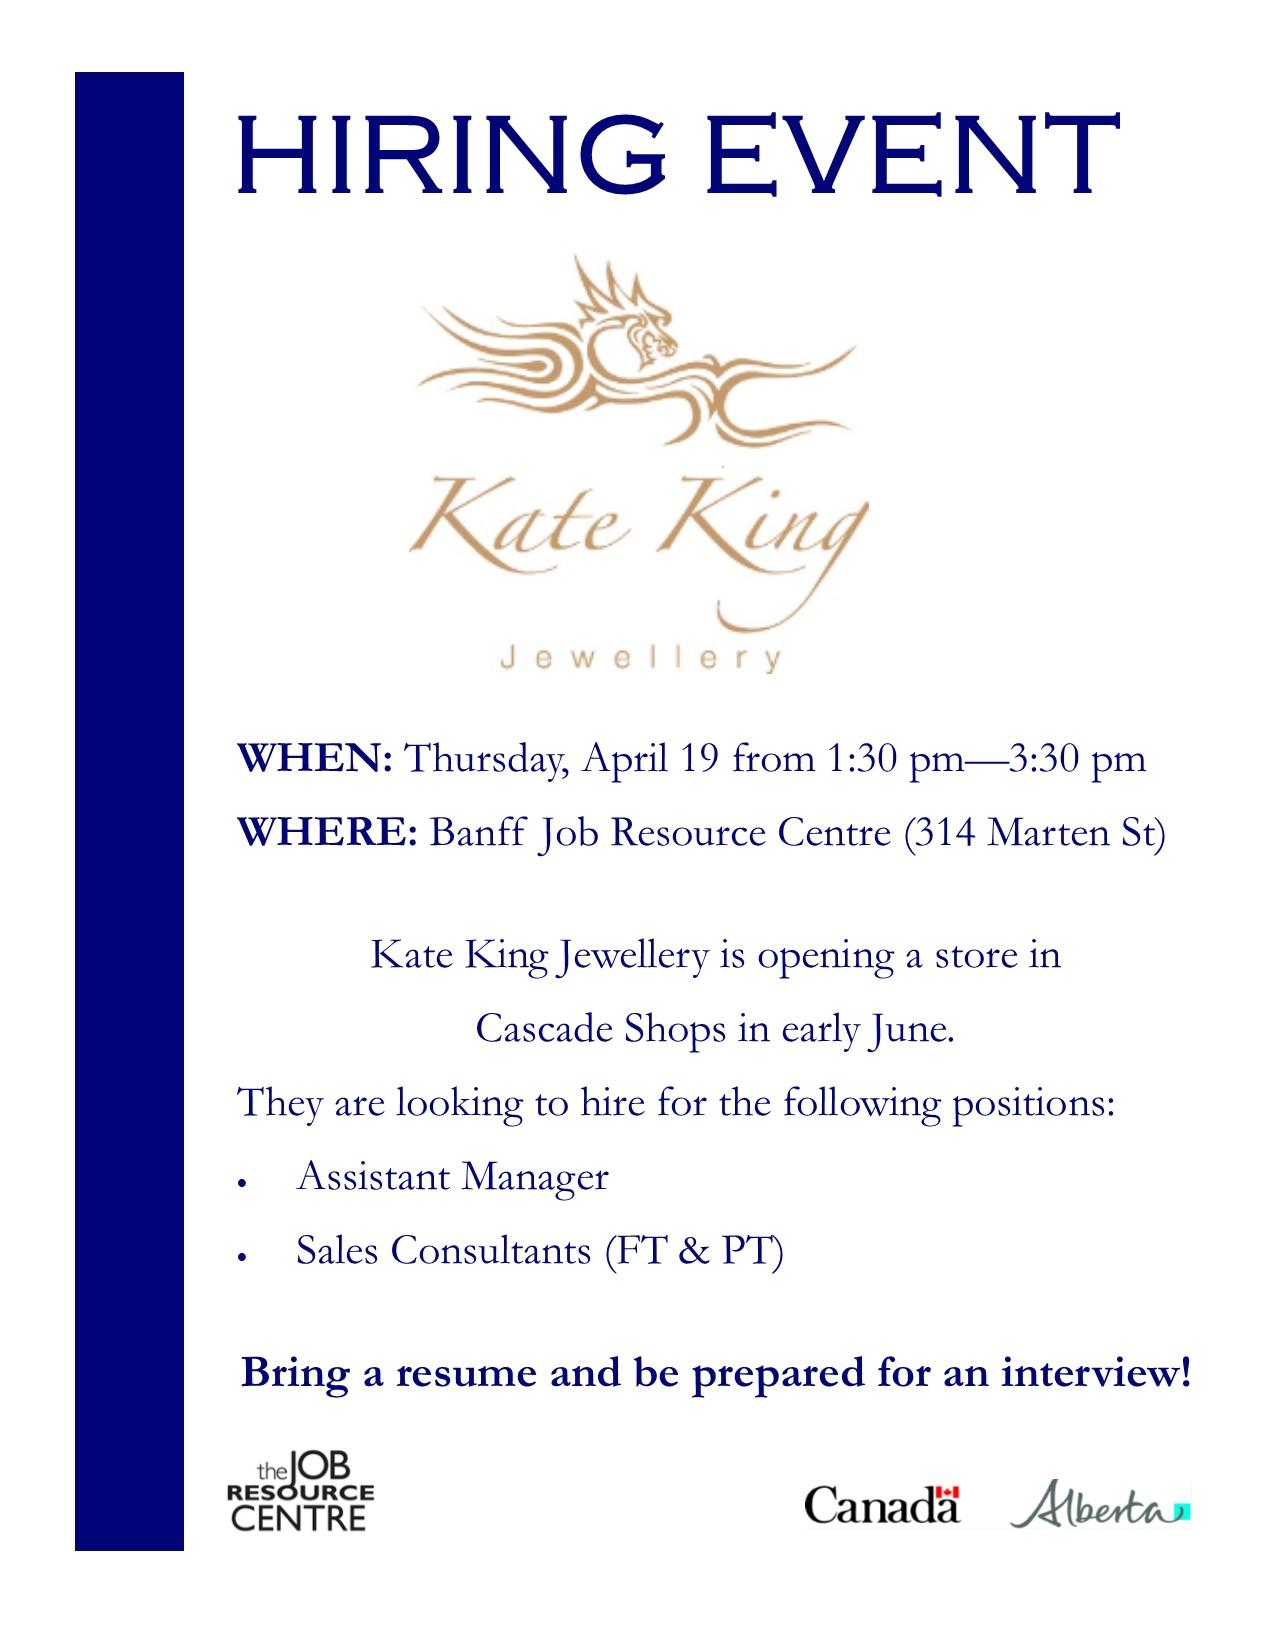 Kate King Jewellery Hiring Event.jpg